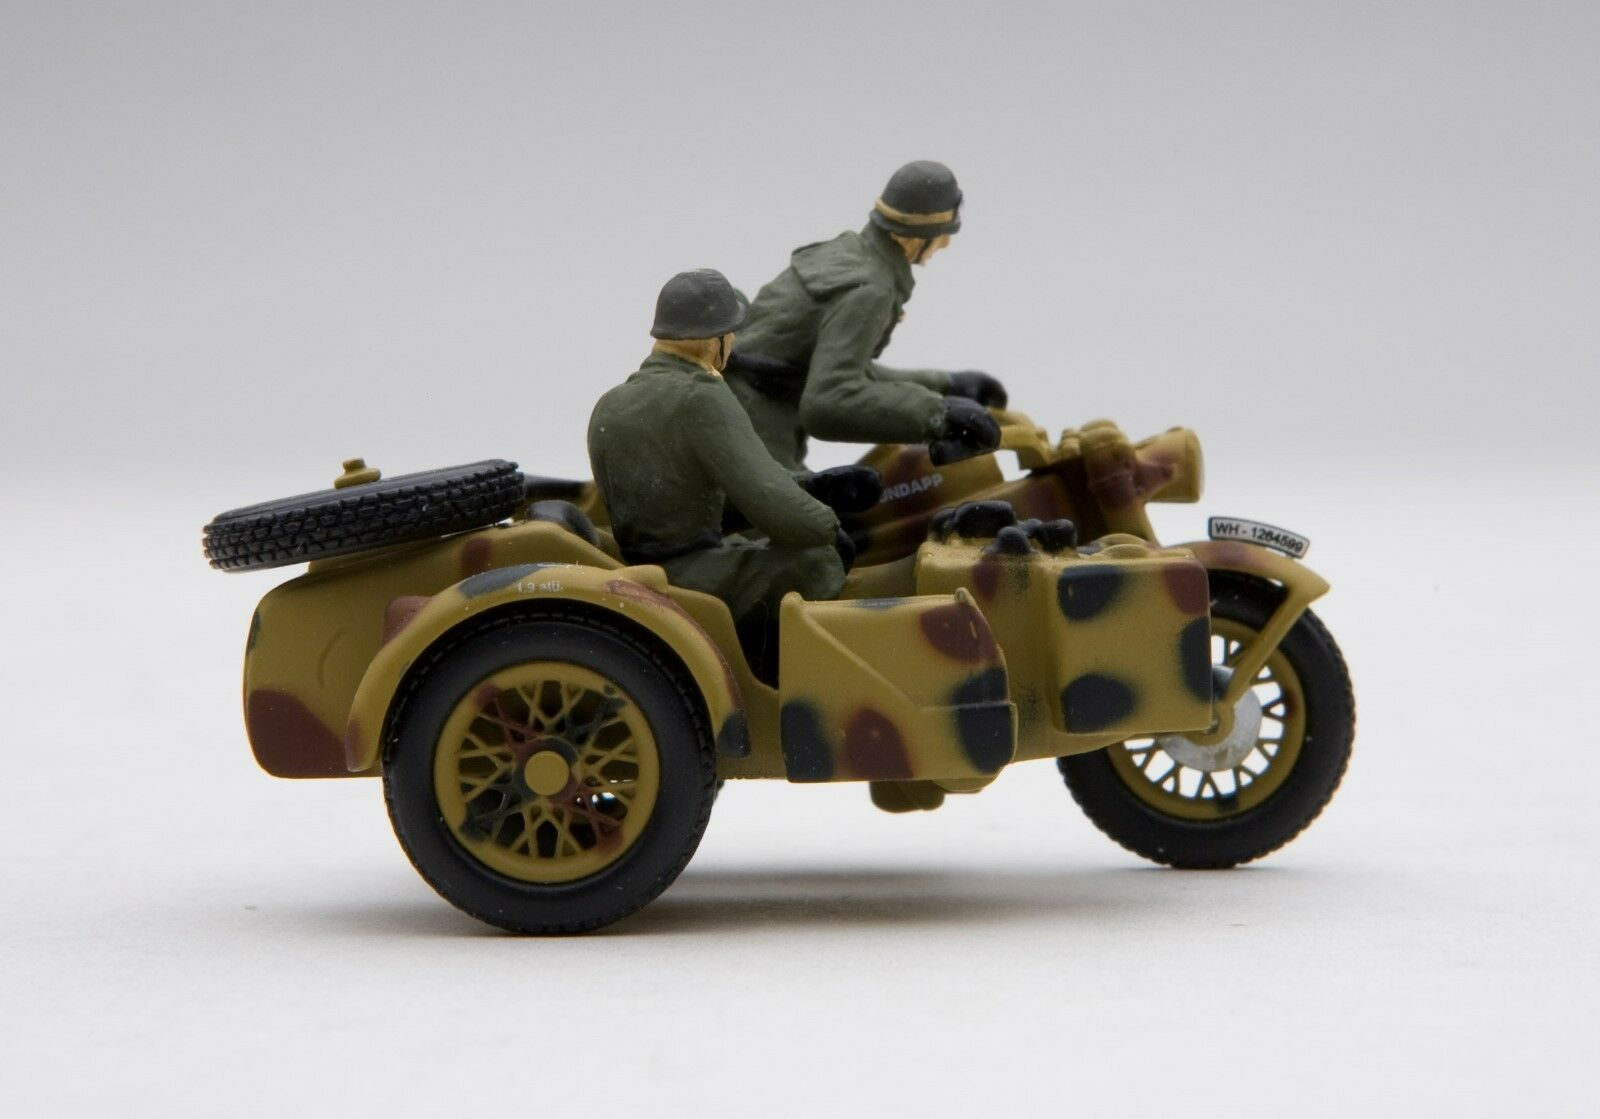 Schuco Piccolo militar Zündapp KS 750  Wehrmacht  con sidecar SHU05066